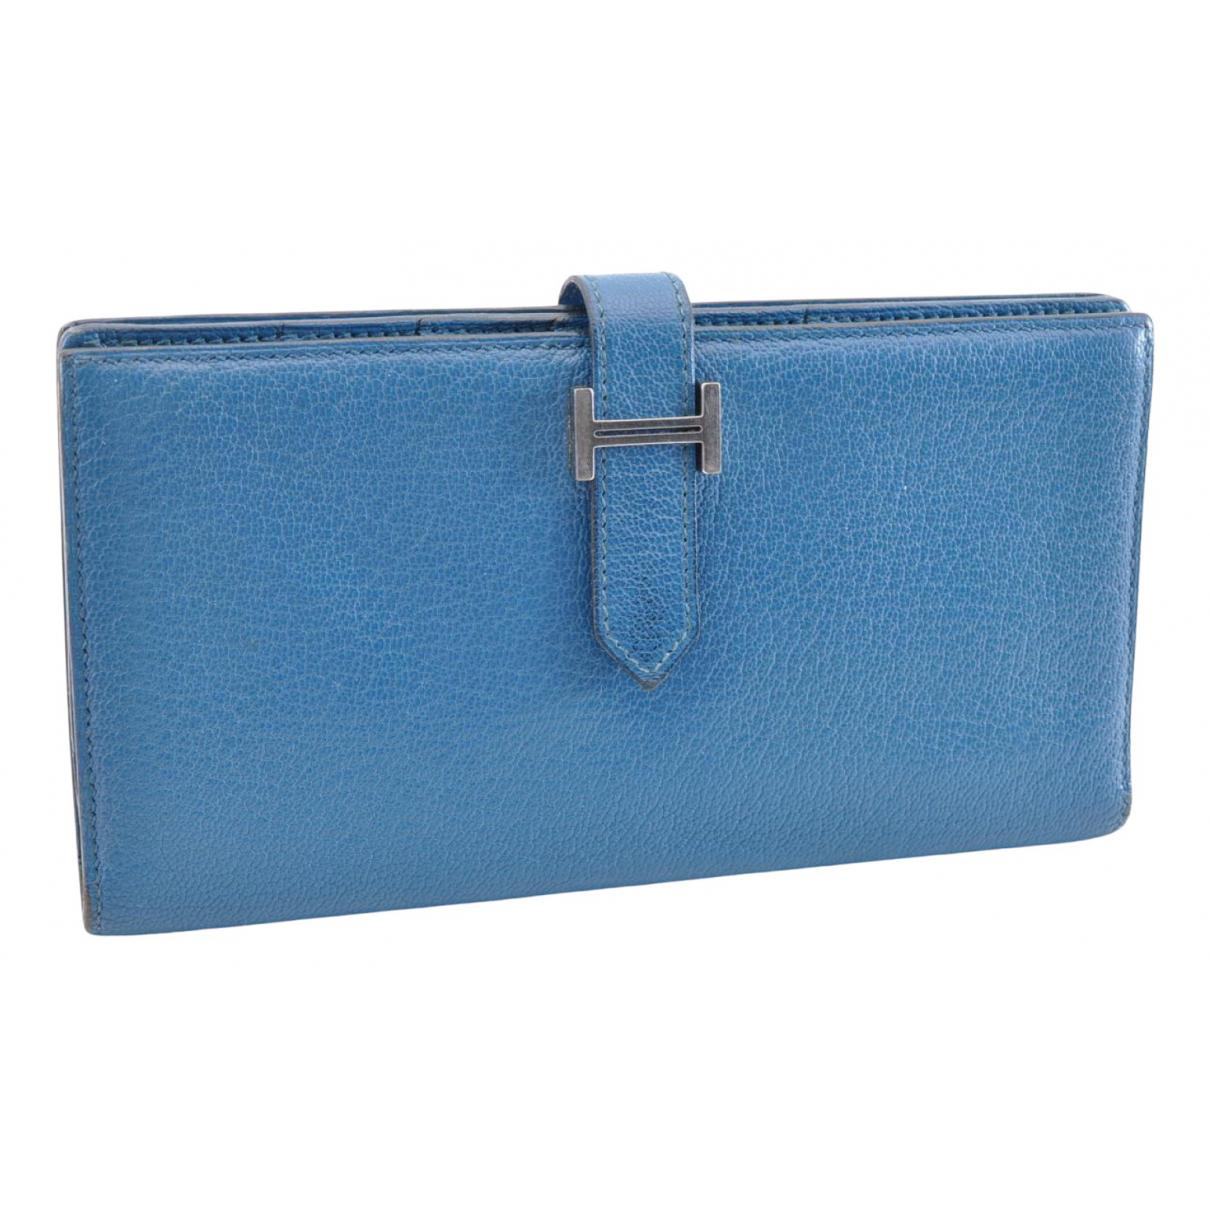 Hermès Béarn Blue Leather wallet for Women N